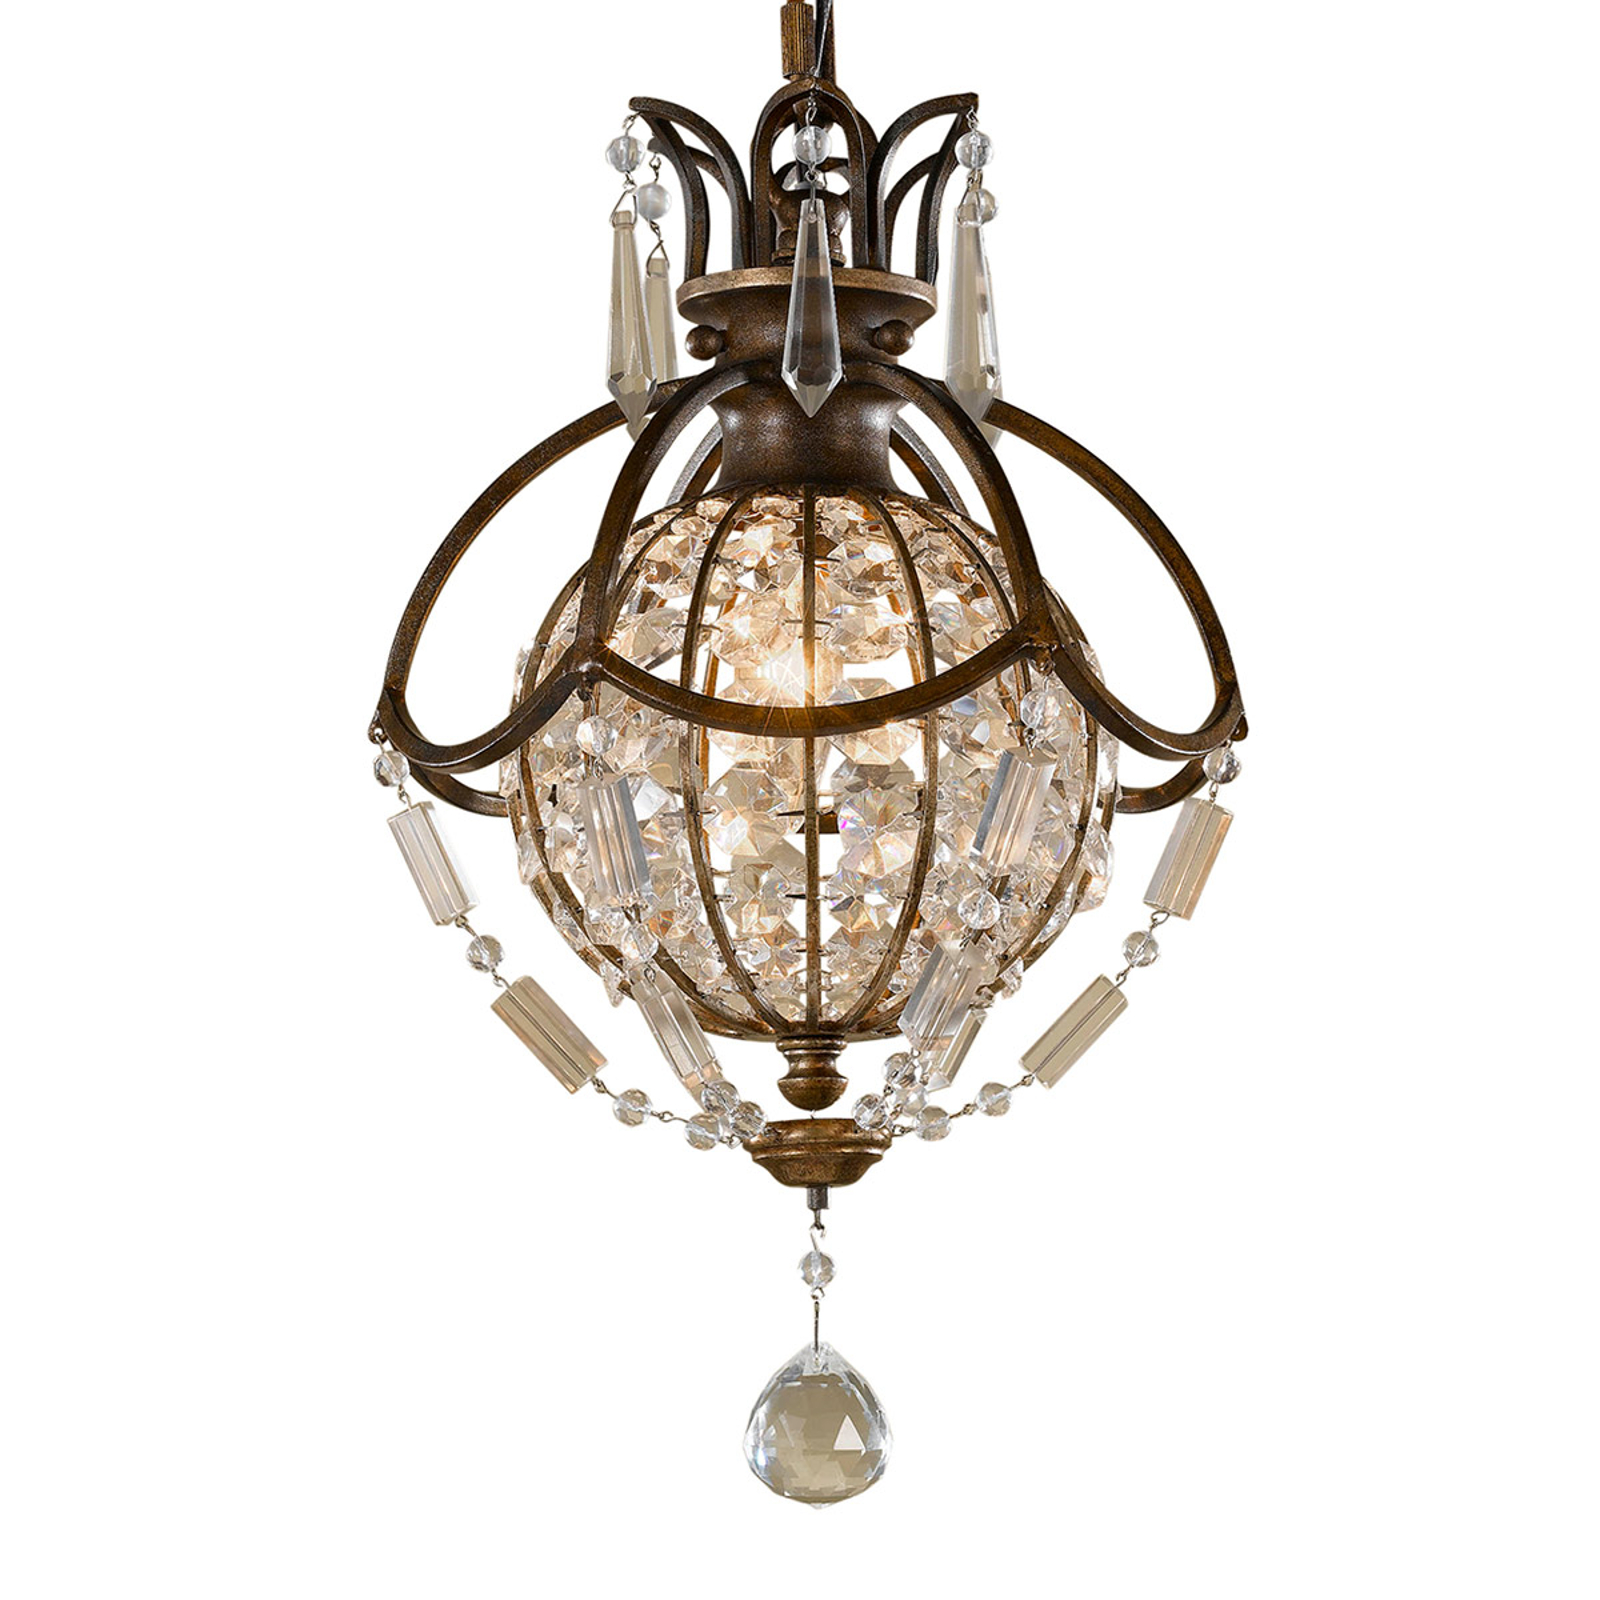 Decoratieve hanglamp Bellini